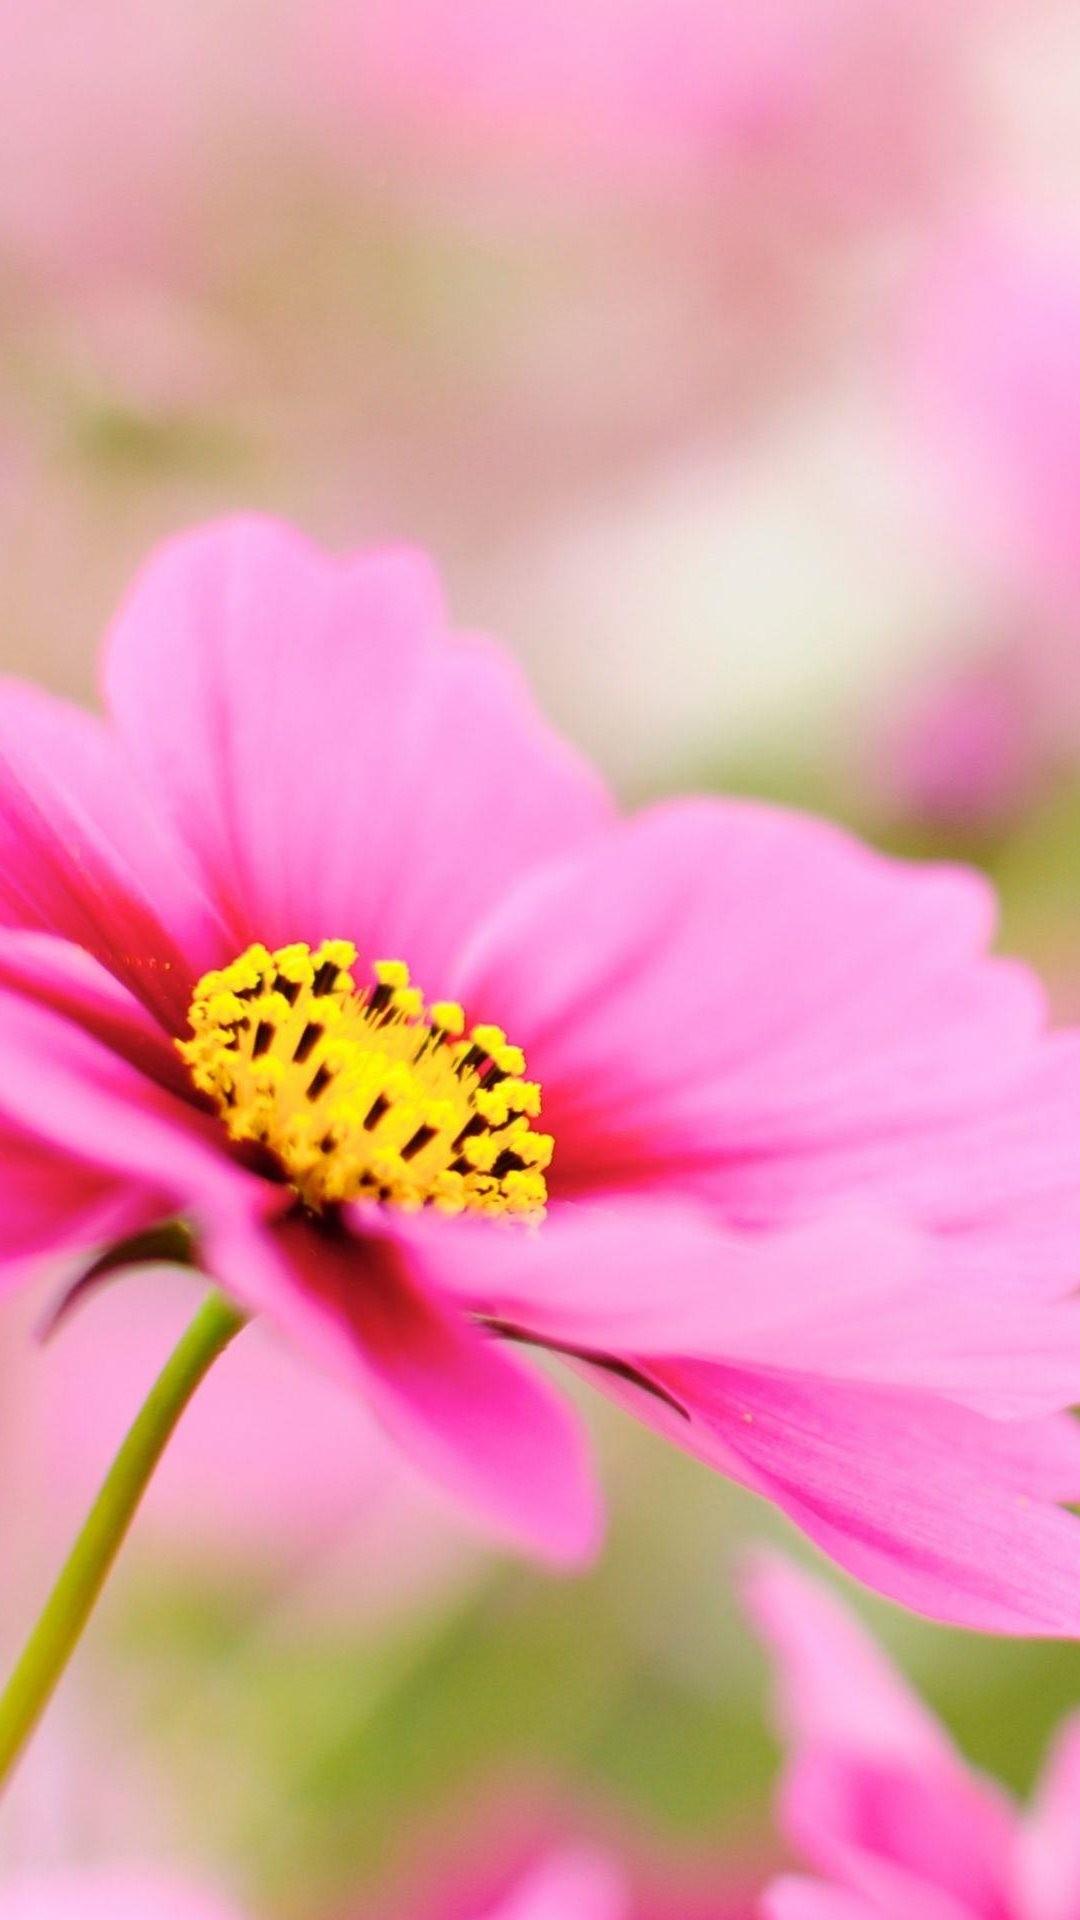 Pink Dahlia Macro Flower iPhone 6 Plus HD Wallpaper …